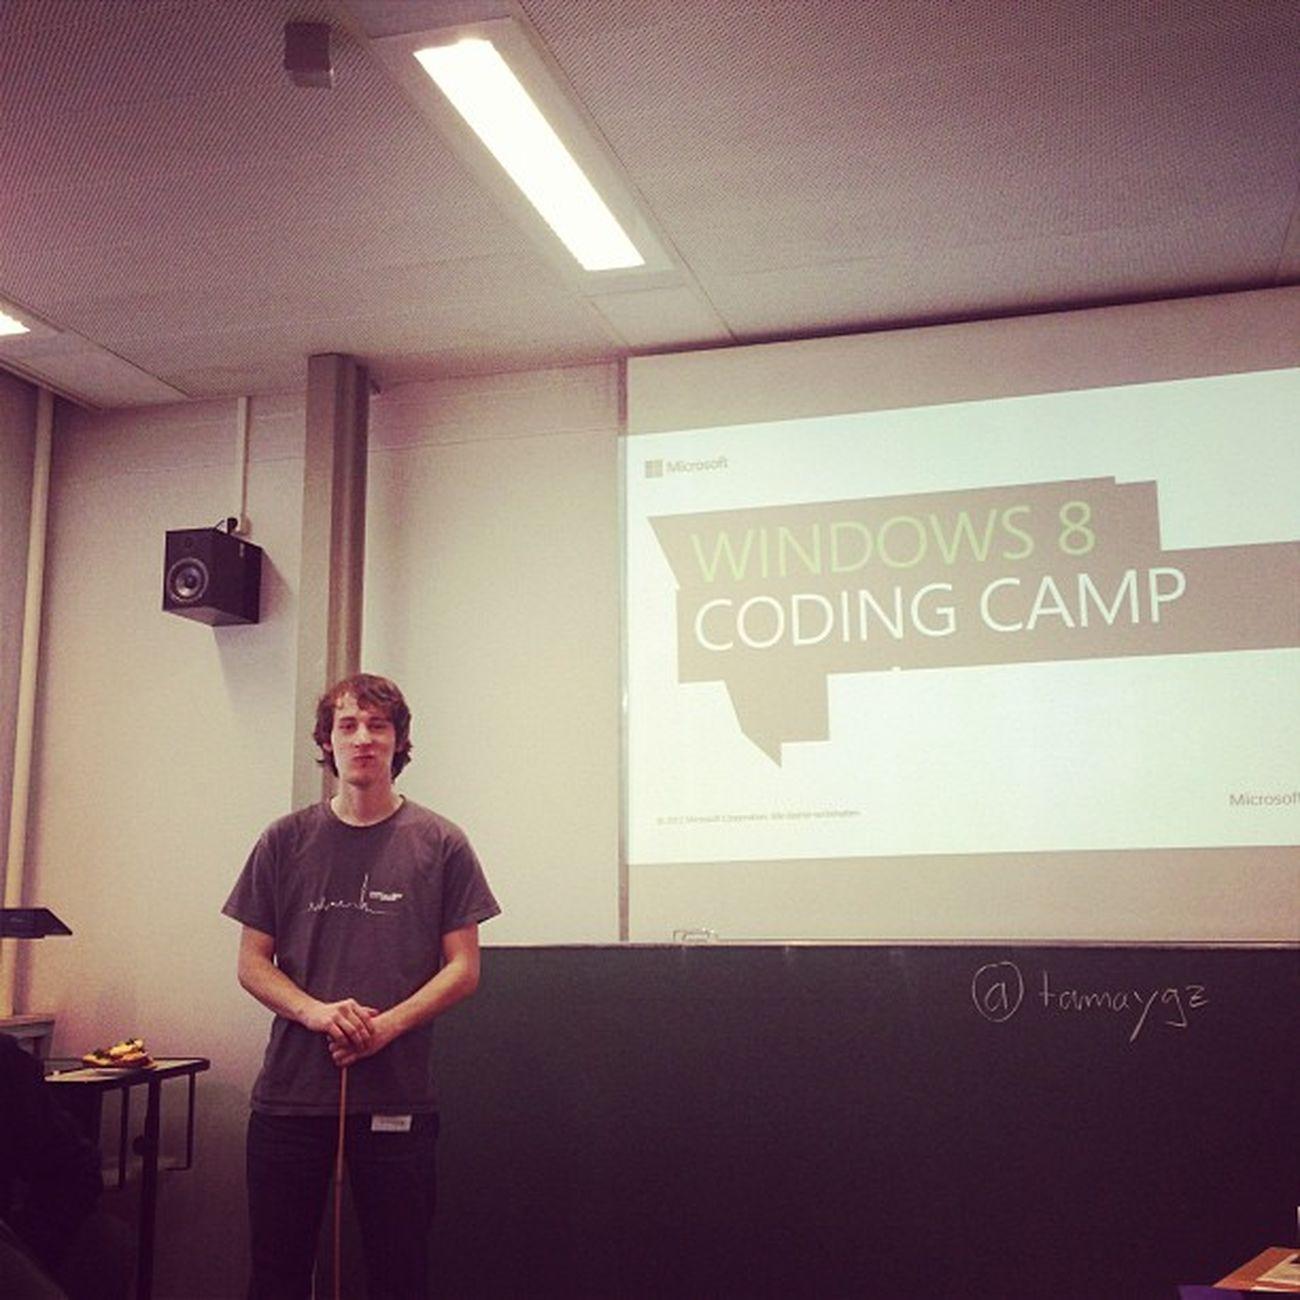 Hallo, kaibrummund! #win8codingcamp Win8codingcamp